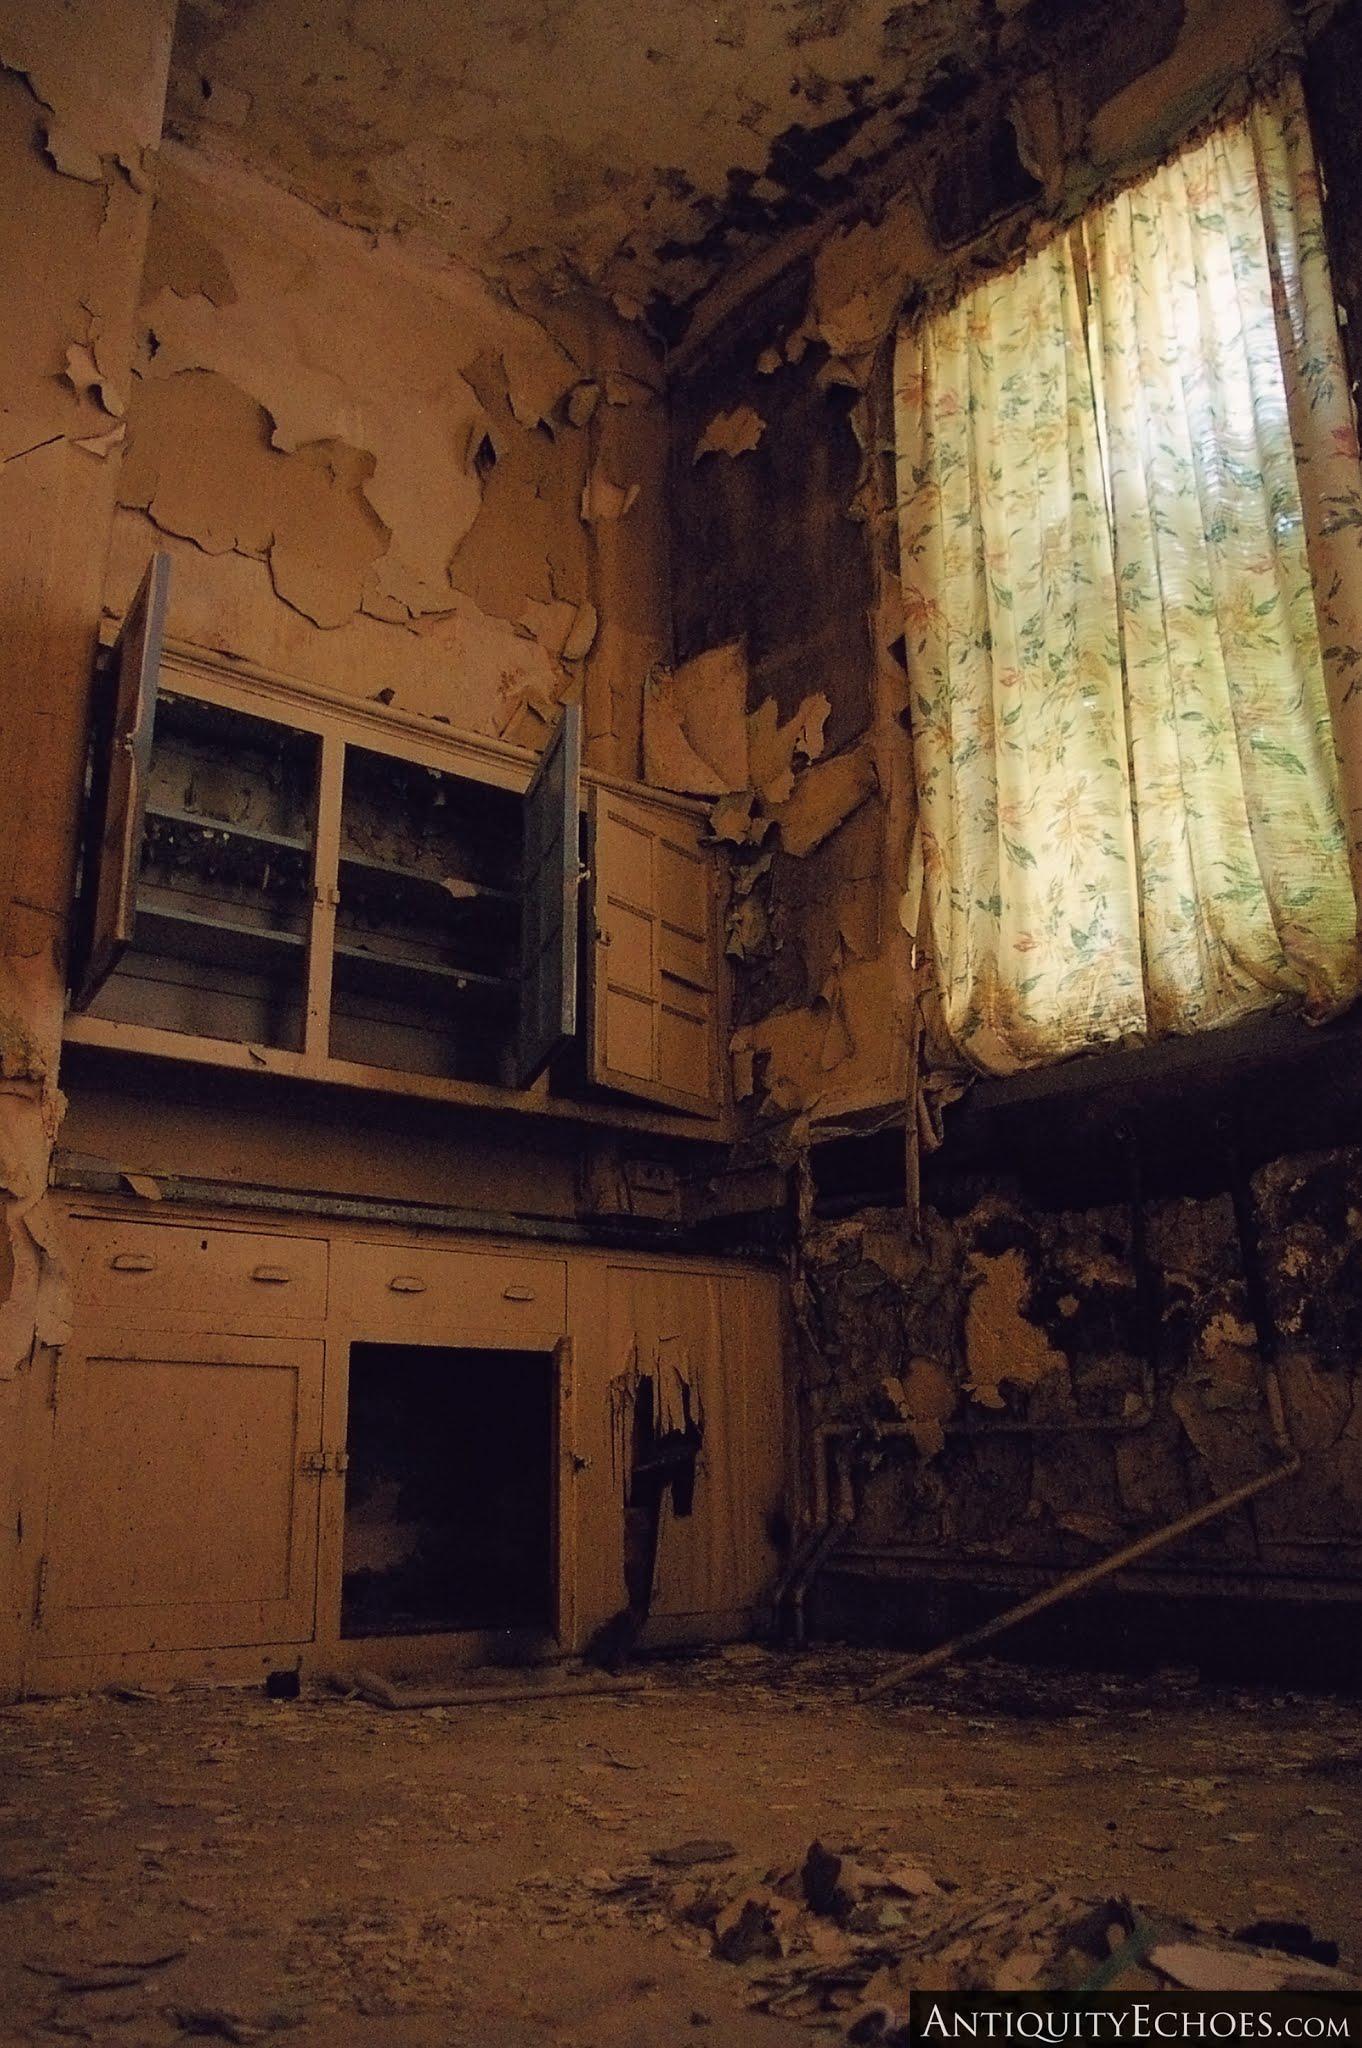 Overbrook Asylum - Rotten Cabinetry